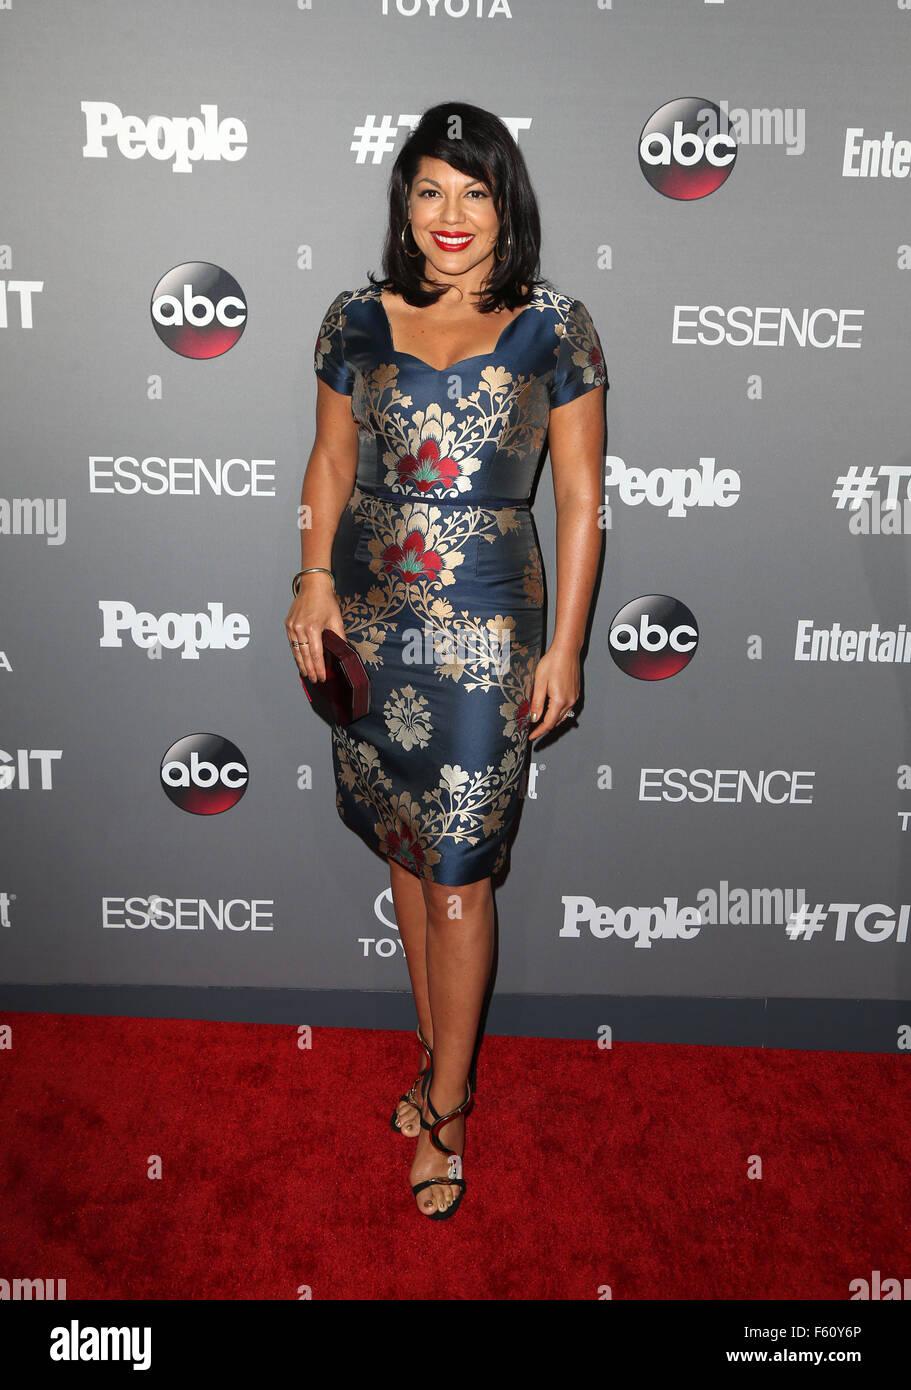 ABC's TGIT premiere event - Arrivals  Featuring: Sara Ramirez Where: Los Angeles, California, United States When: Stock Photo